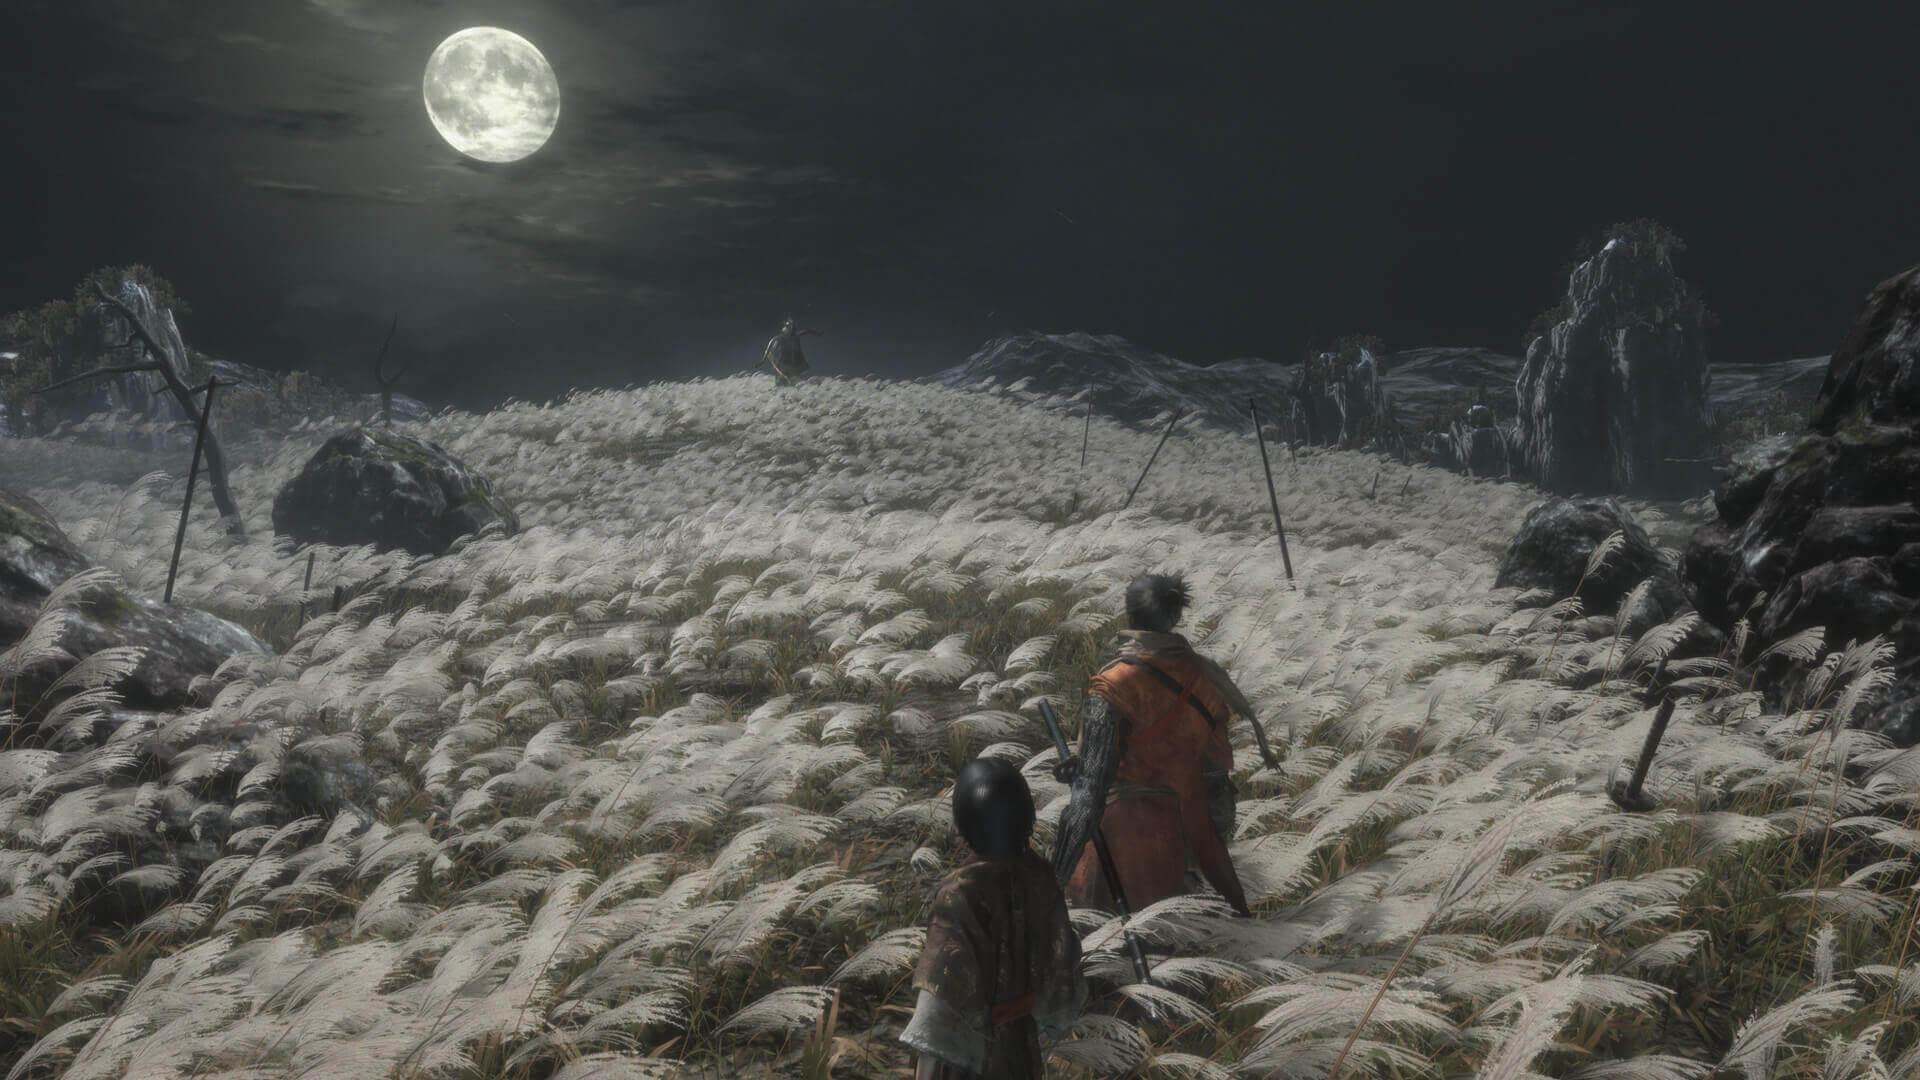 sekiro e os shinobis no japao feudal